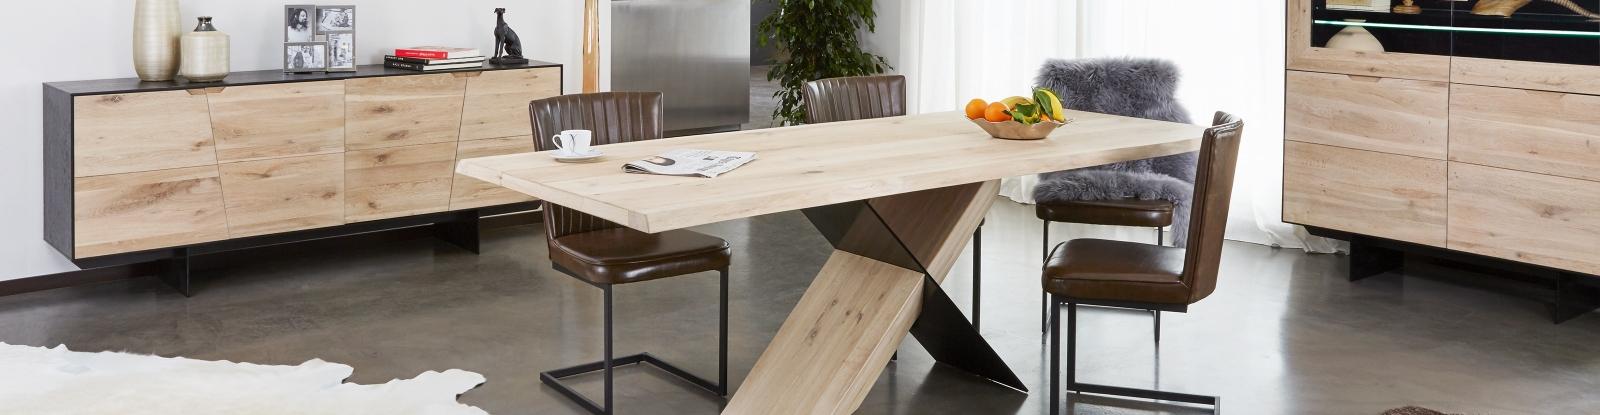 INSTINCT DINING TABLE